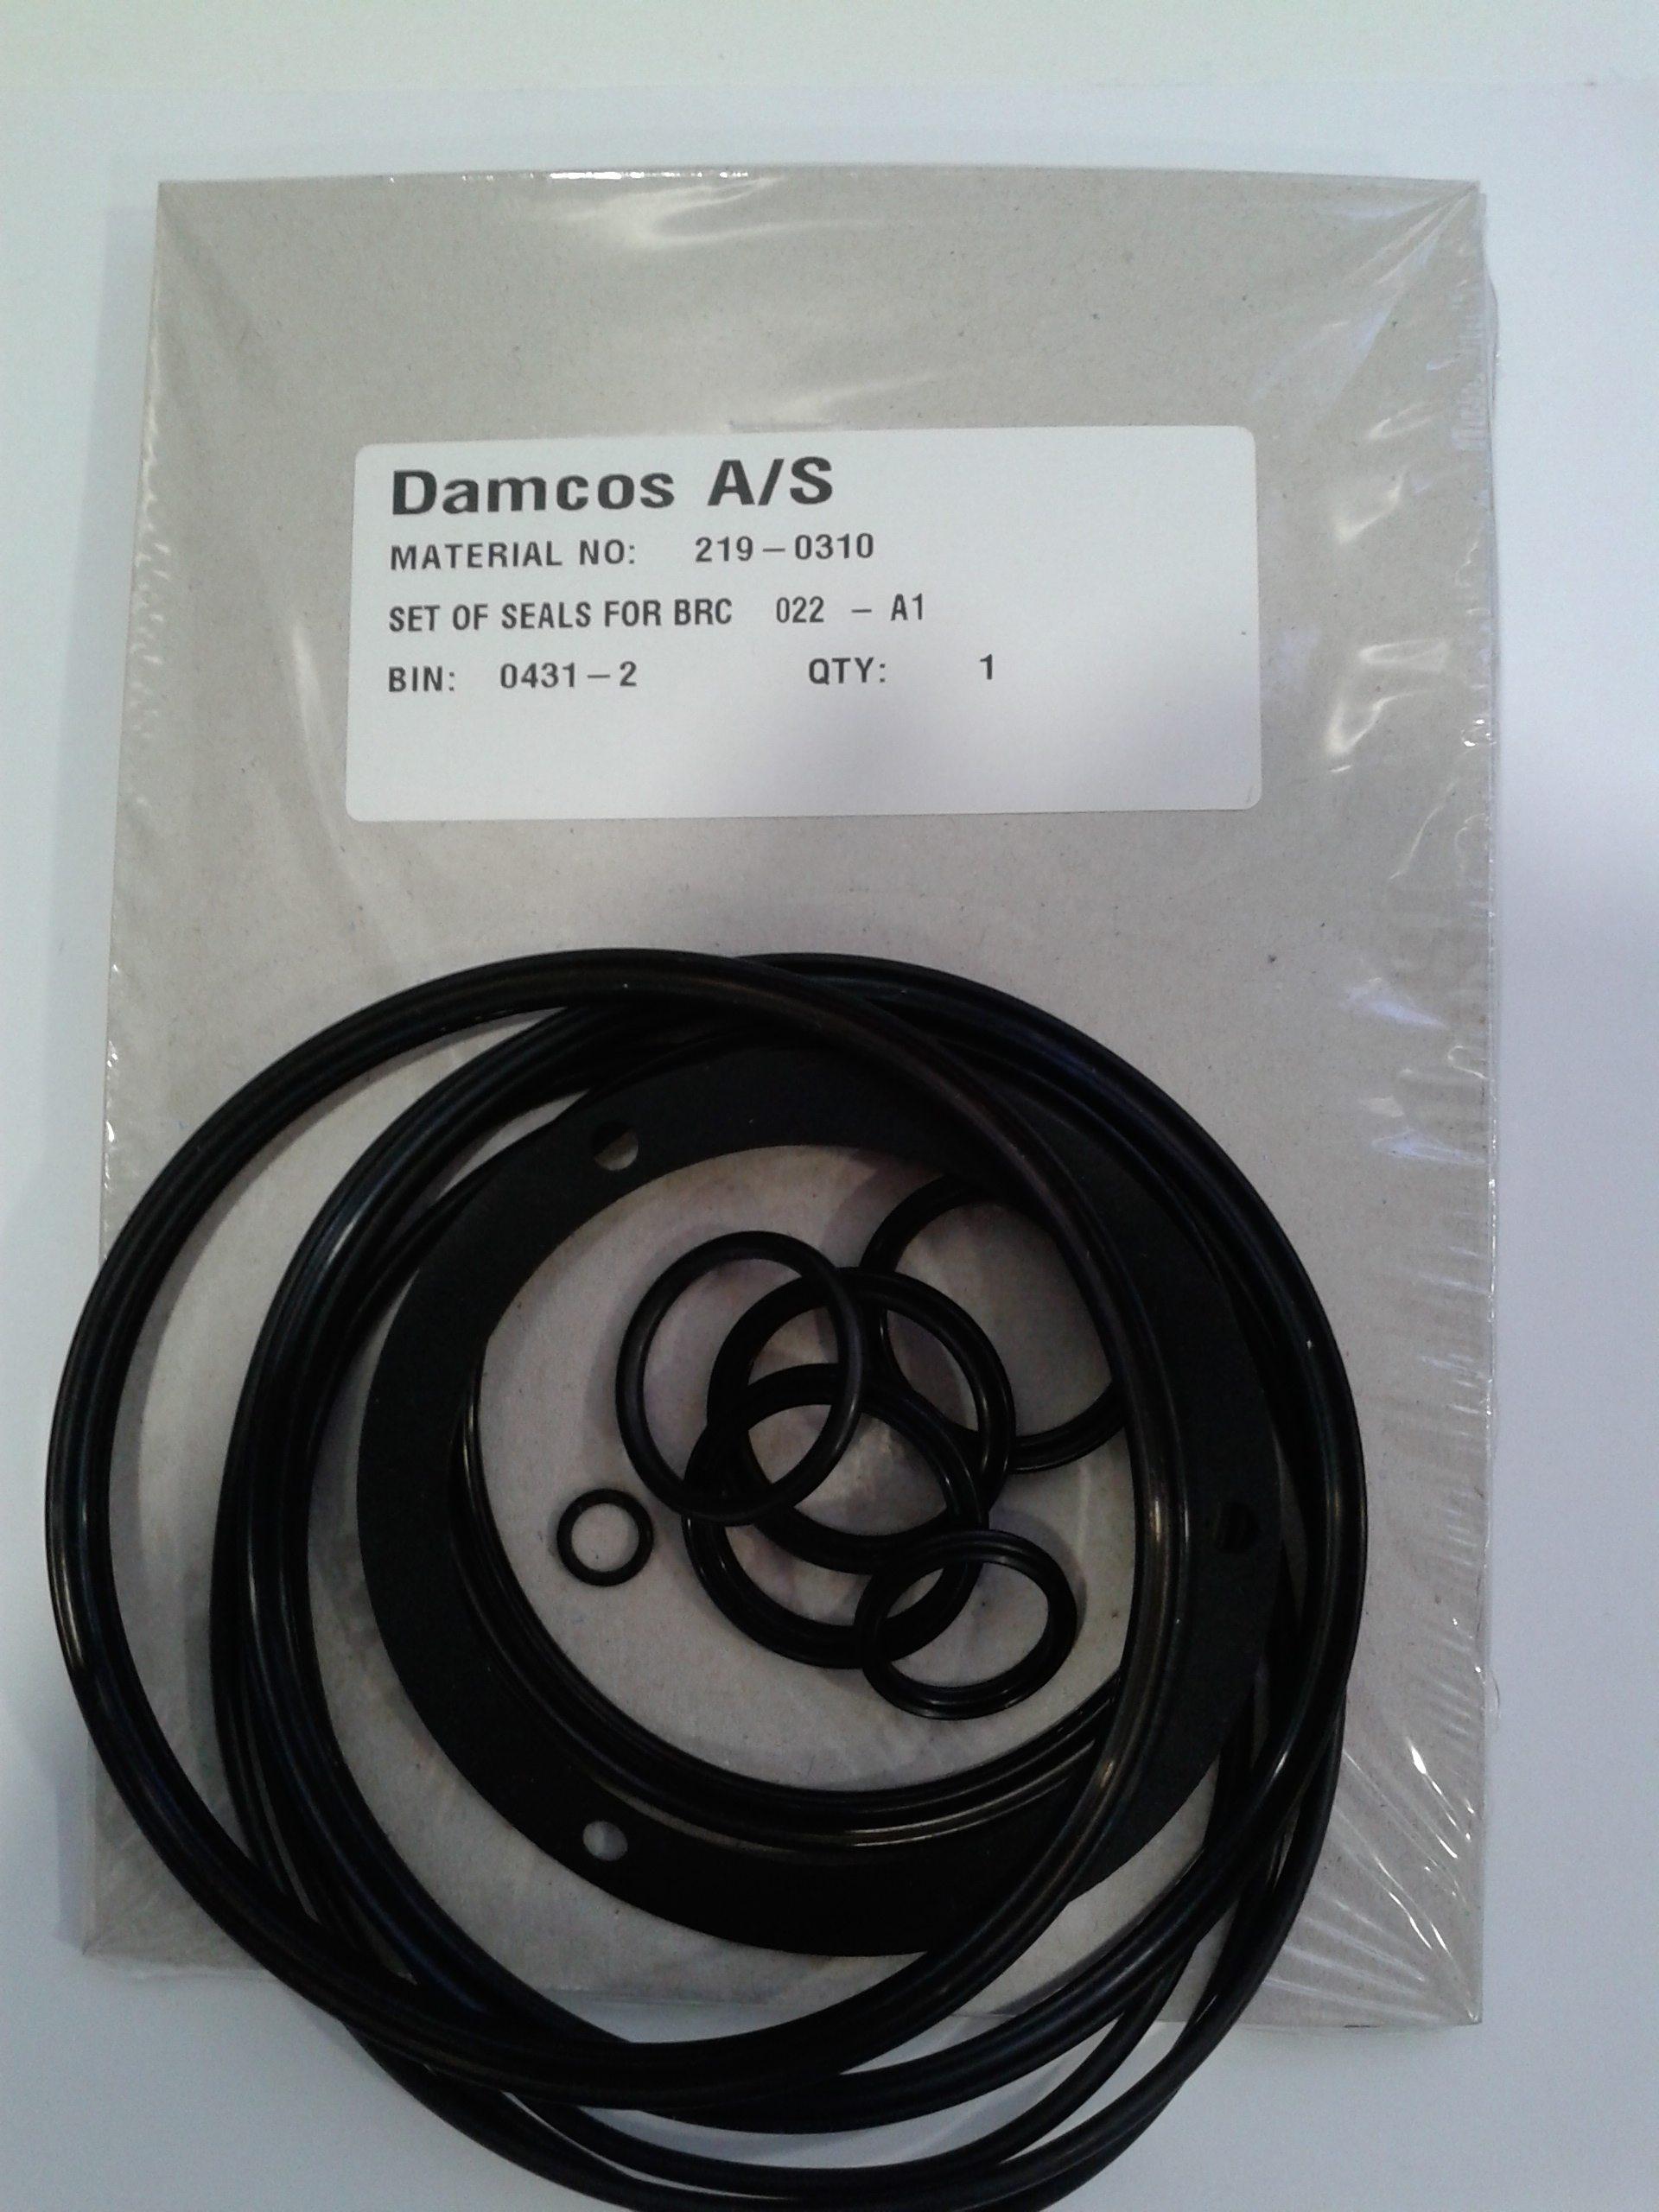 Damcos-Danfoss-BRC-022-A1-Seal-Kit-219-0310